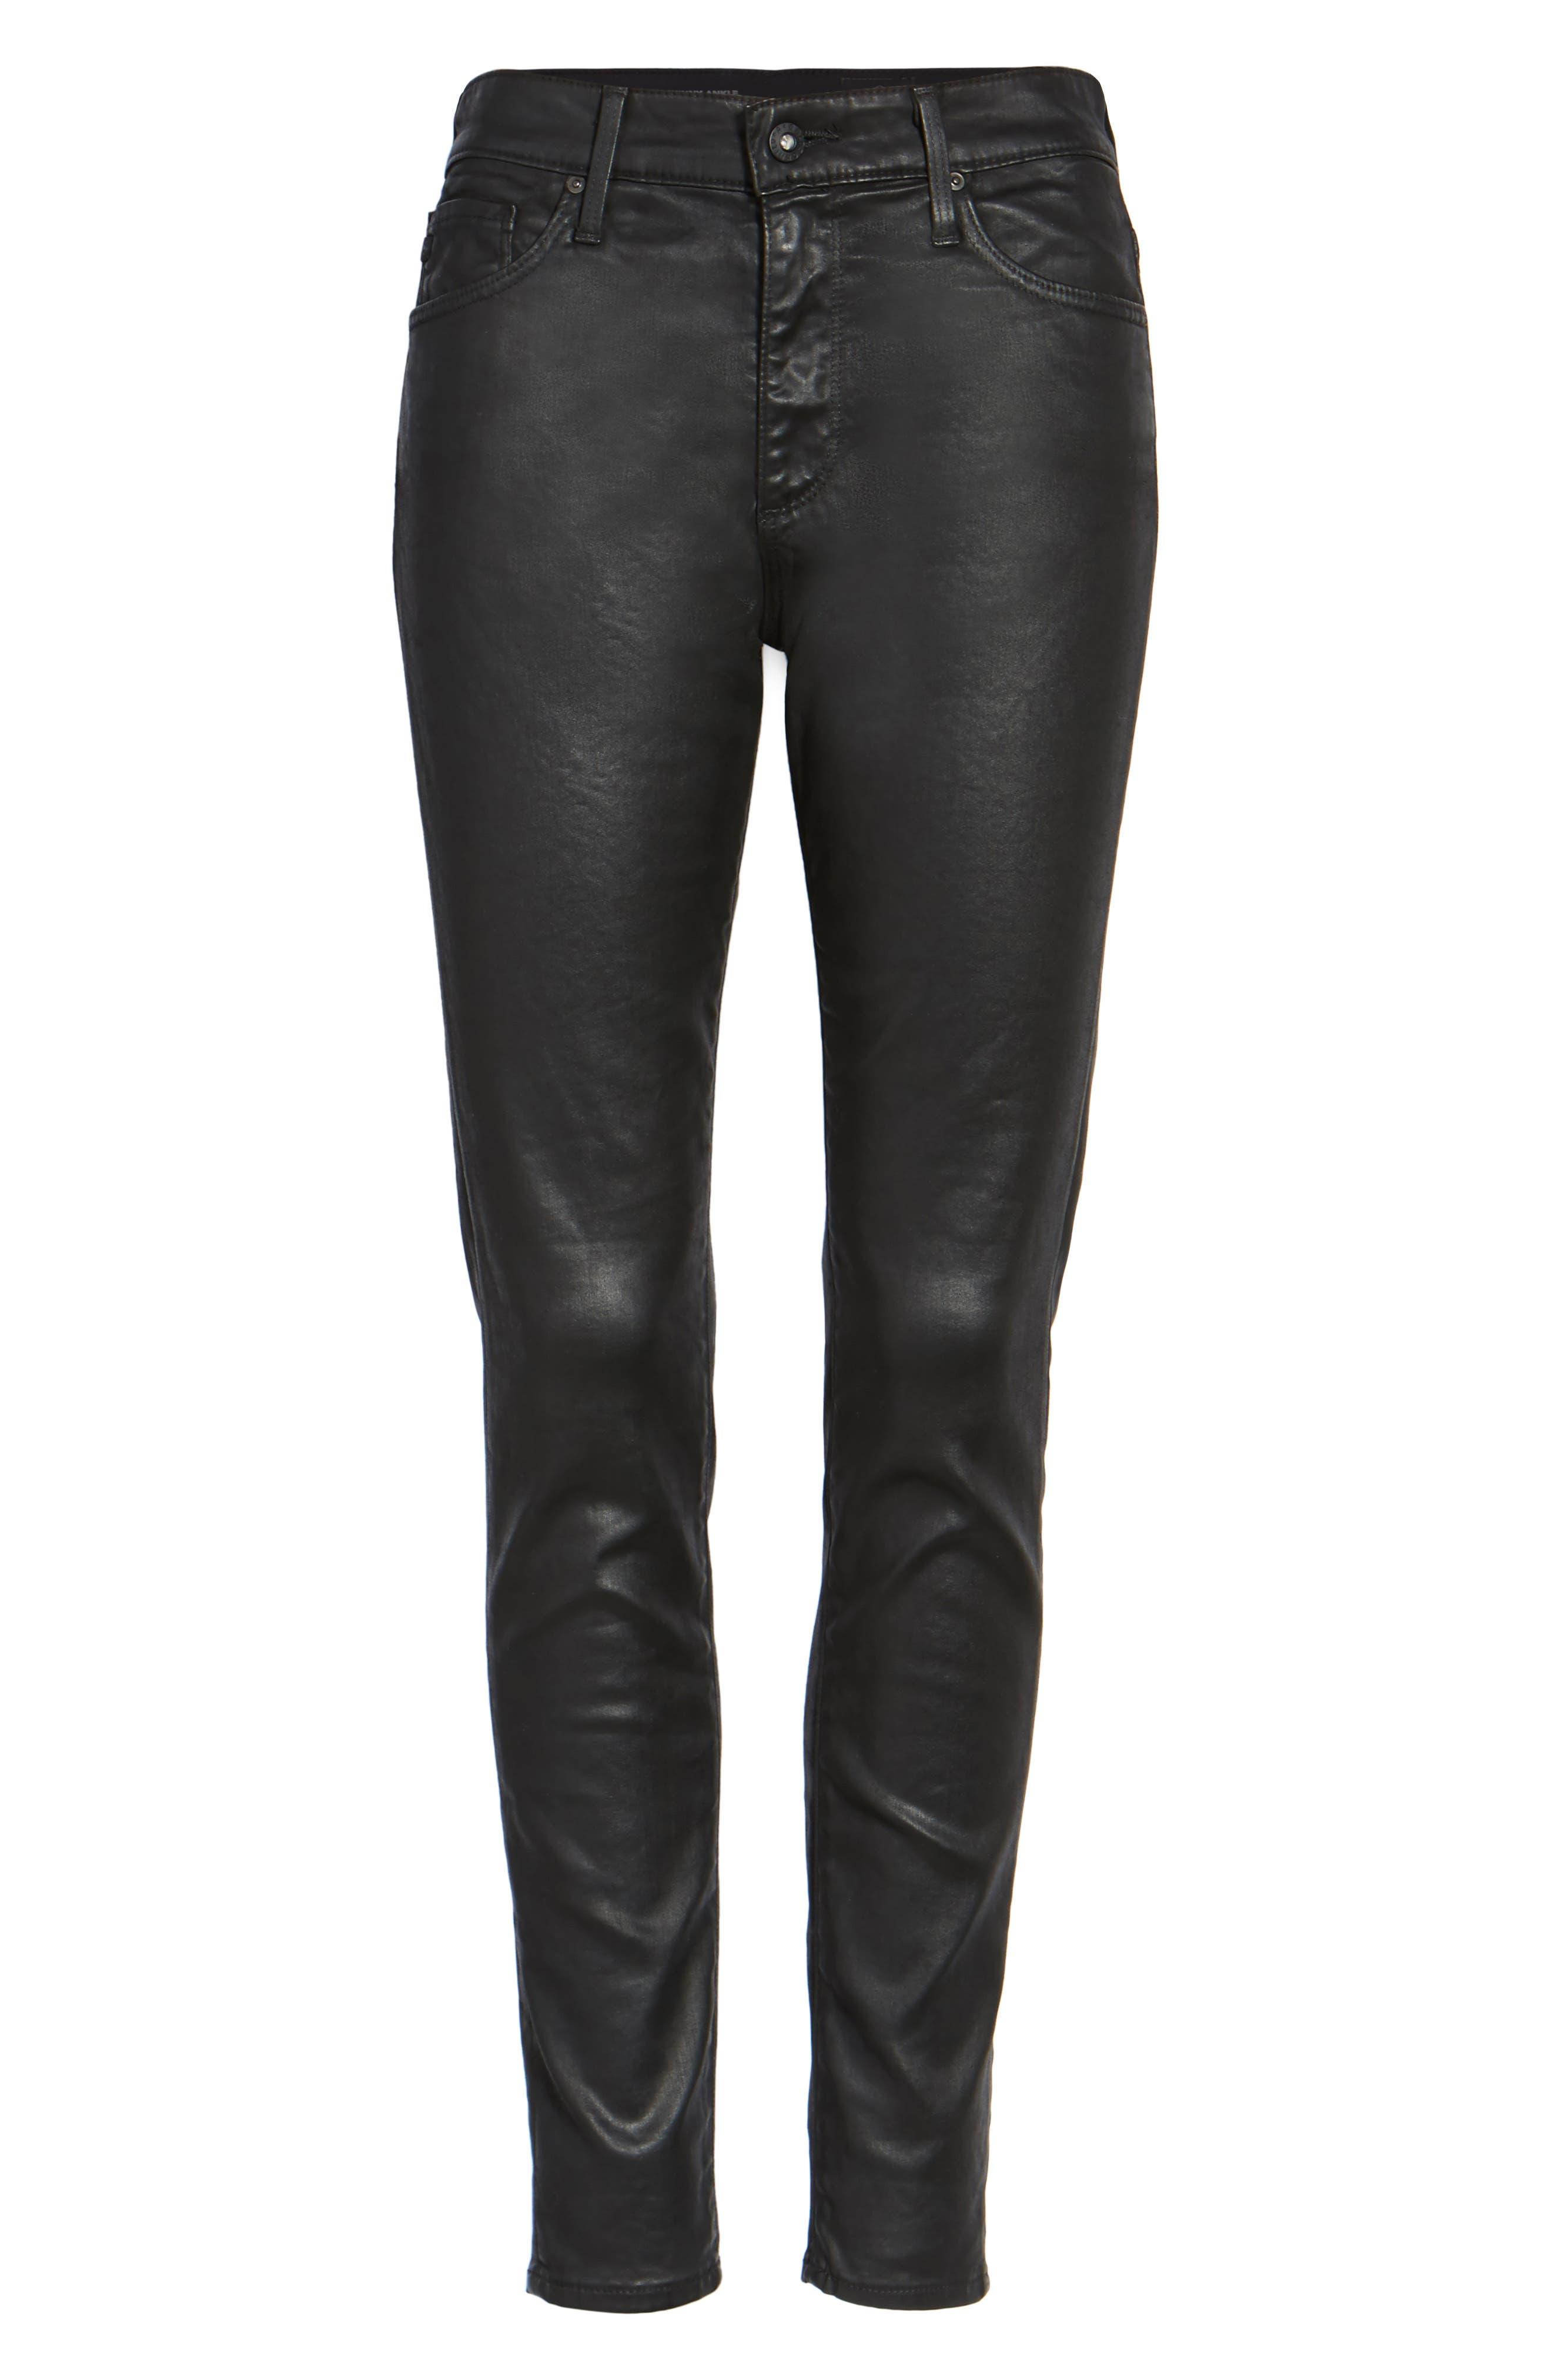 Farrah High Waist Ankle Skinny Jeans,                             Alternate thumbnail 6, color,                             Leatherette Super Black